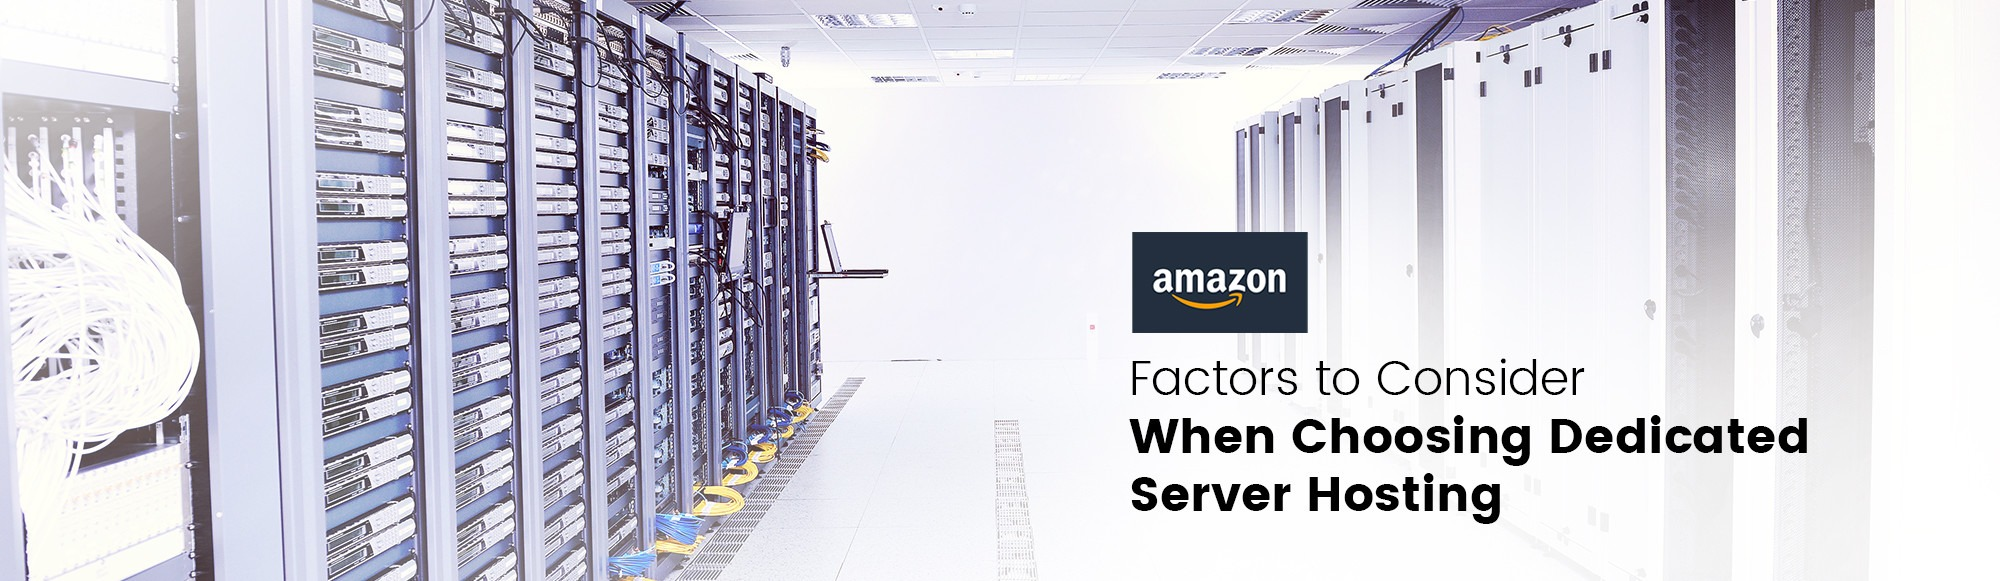 Factors to Consider When Choosing Dedicated Server Hosting